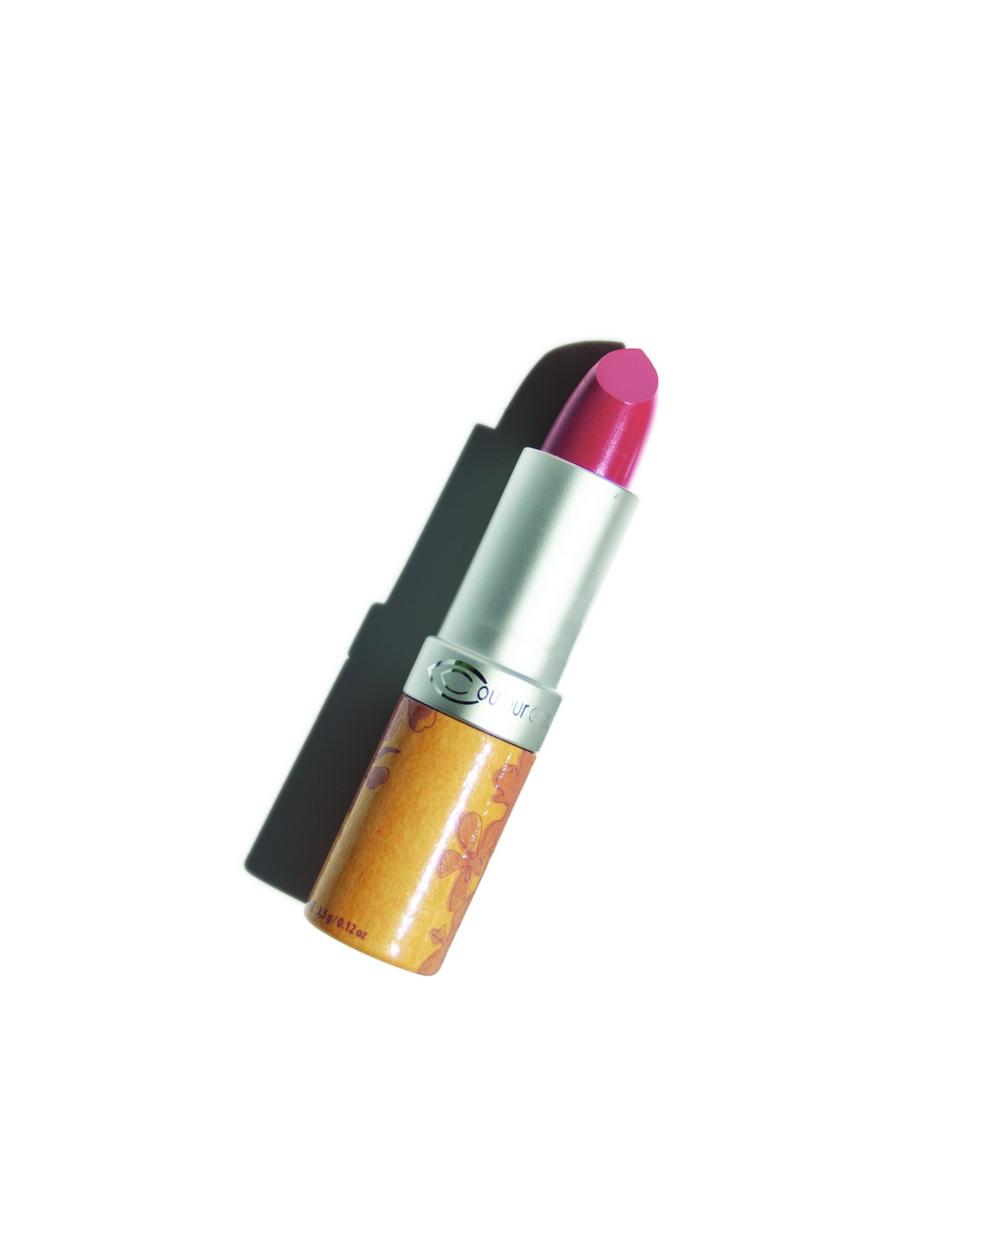 Rouge a levres rose bruyere couleur caramel 117287 embellissetvous fr